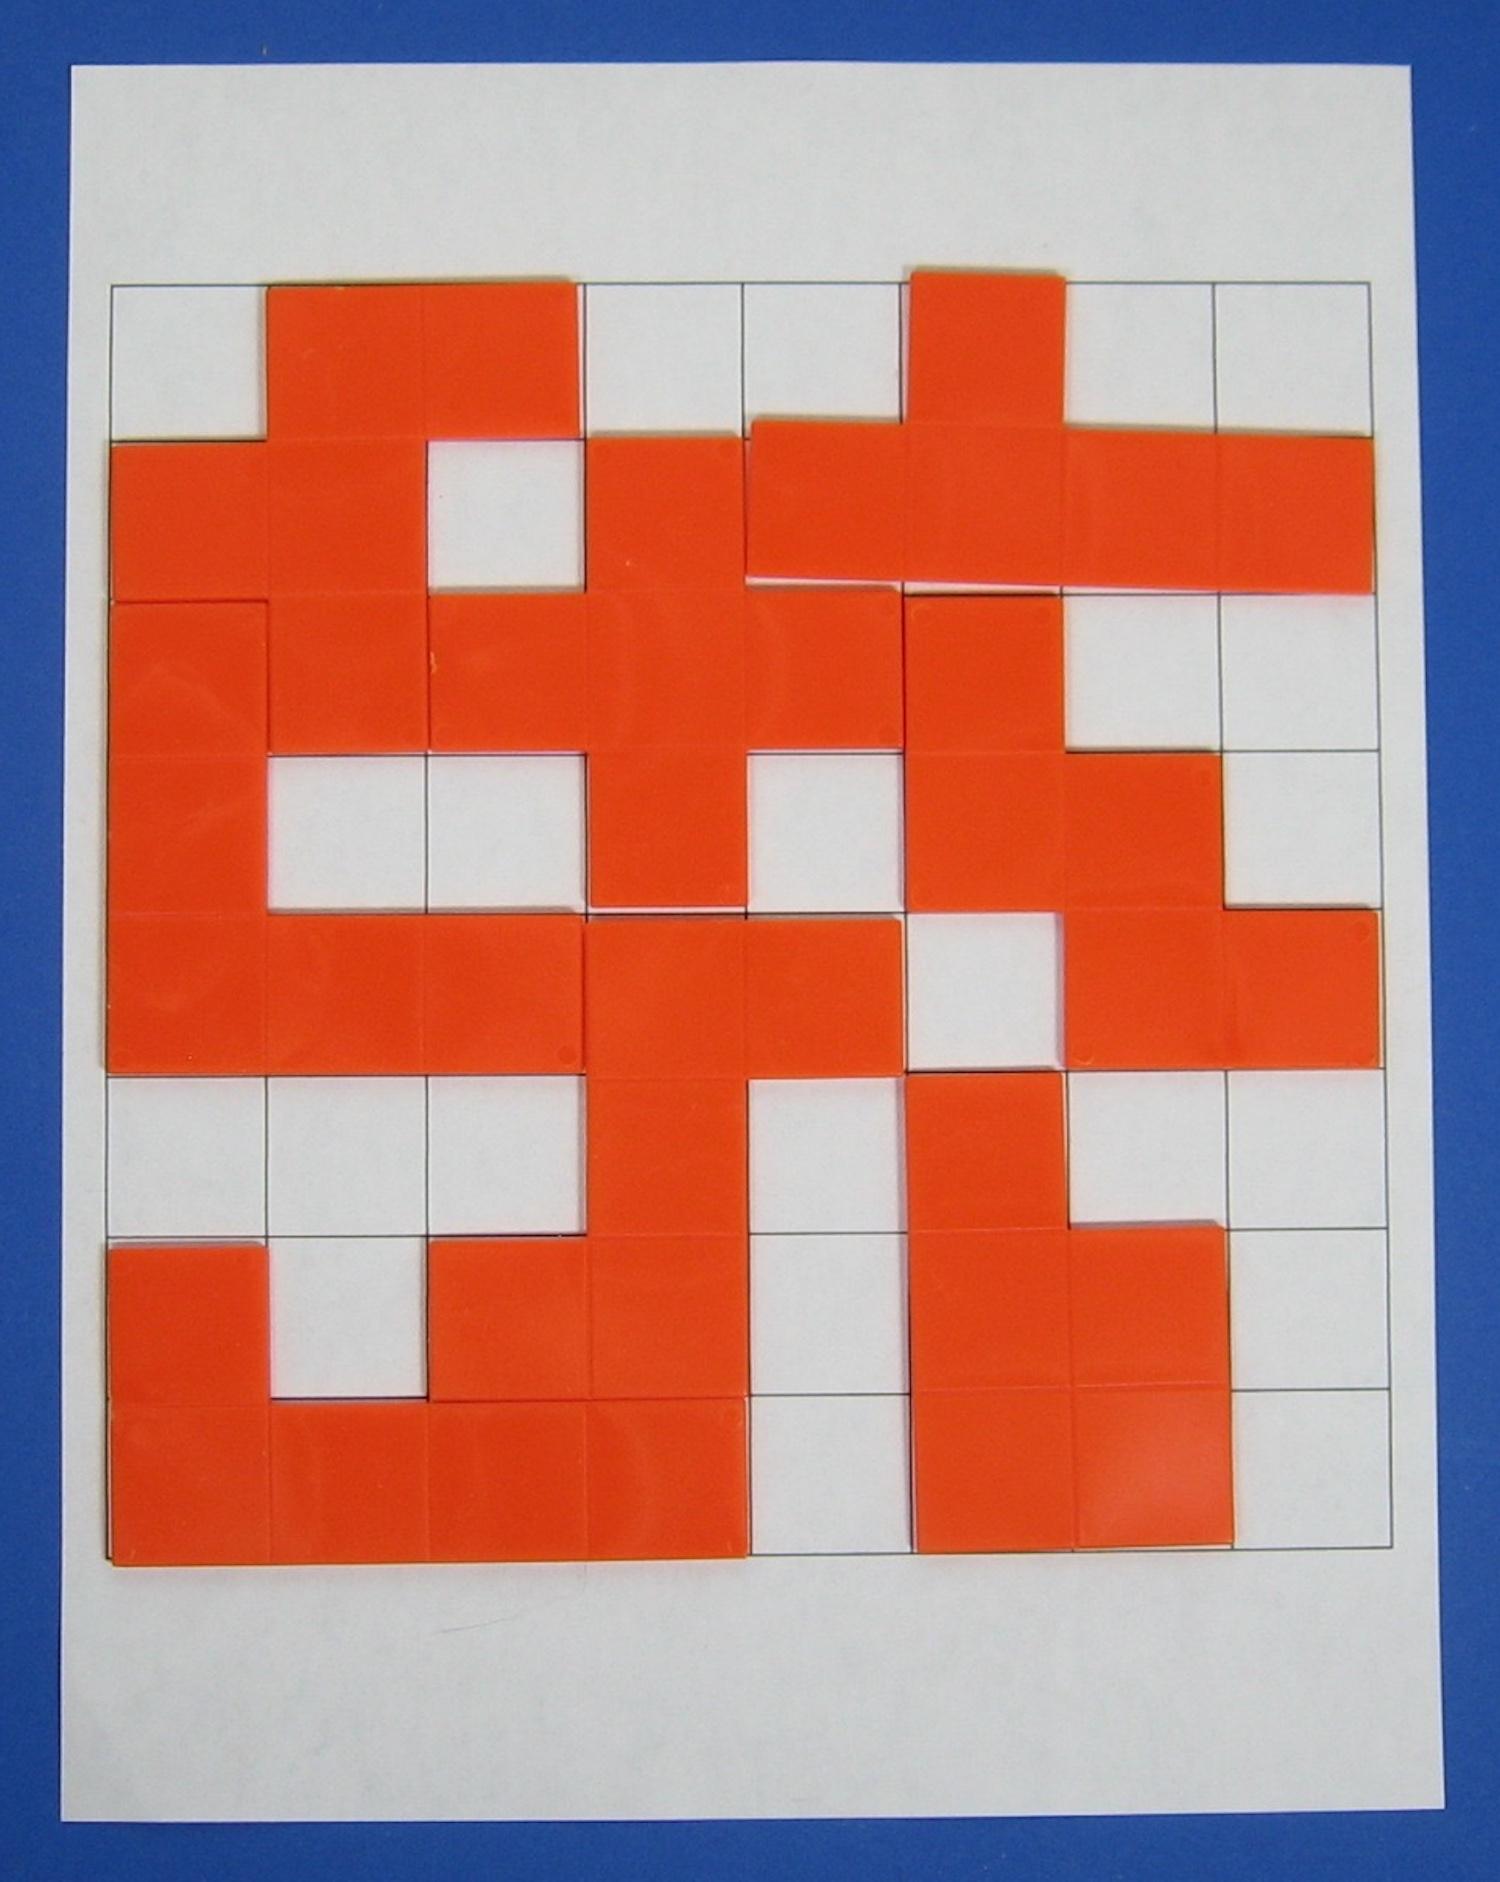 pentomino-checkers.jpg